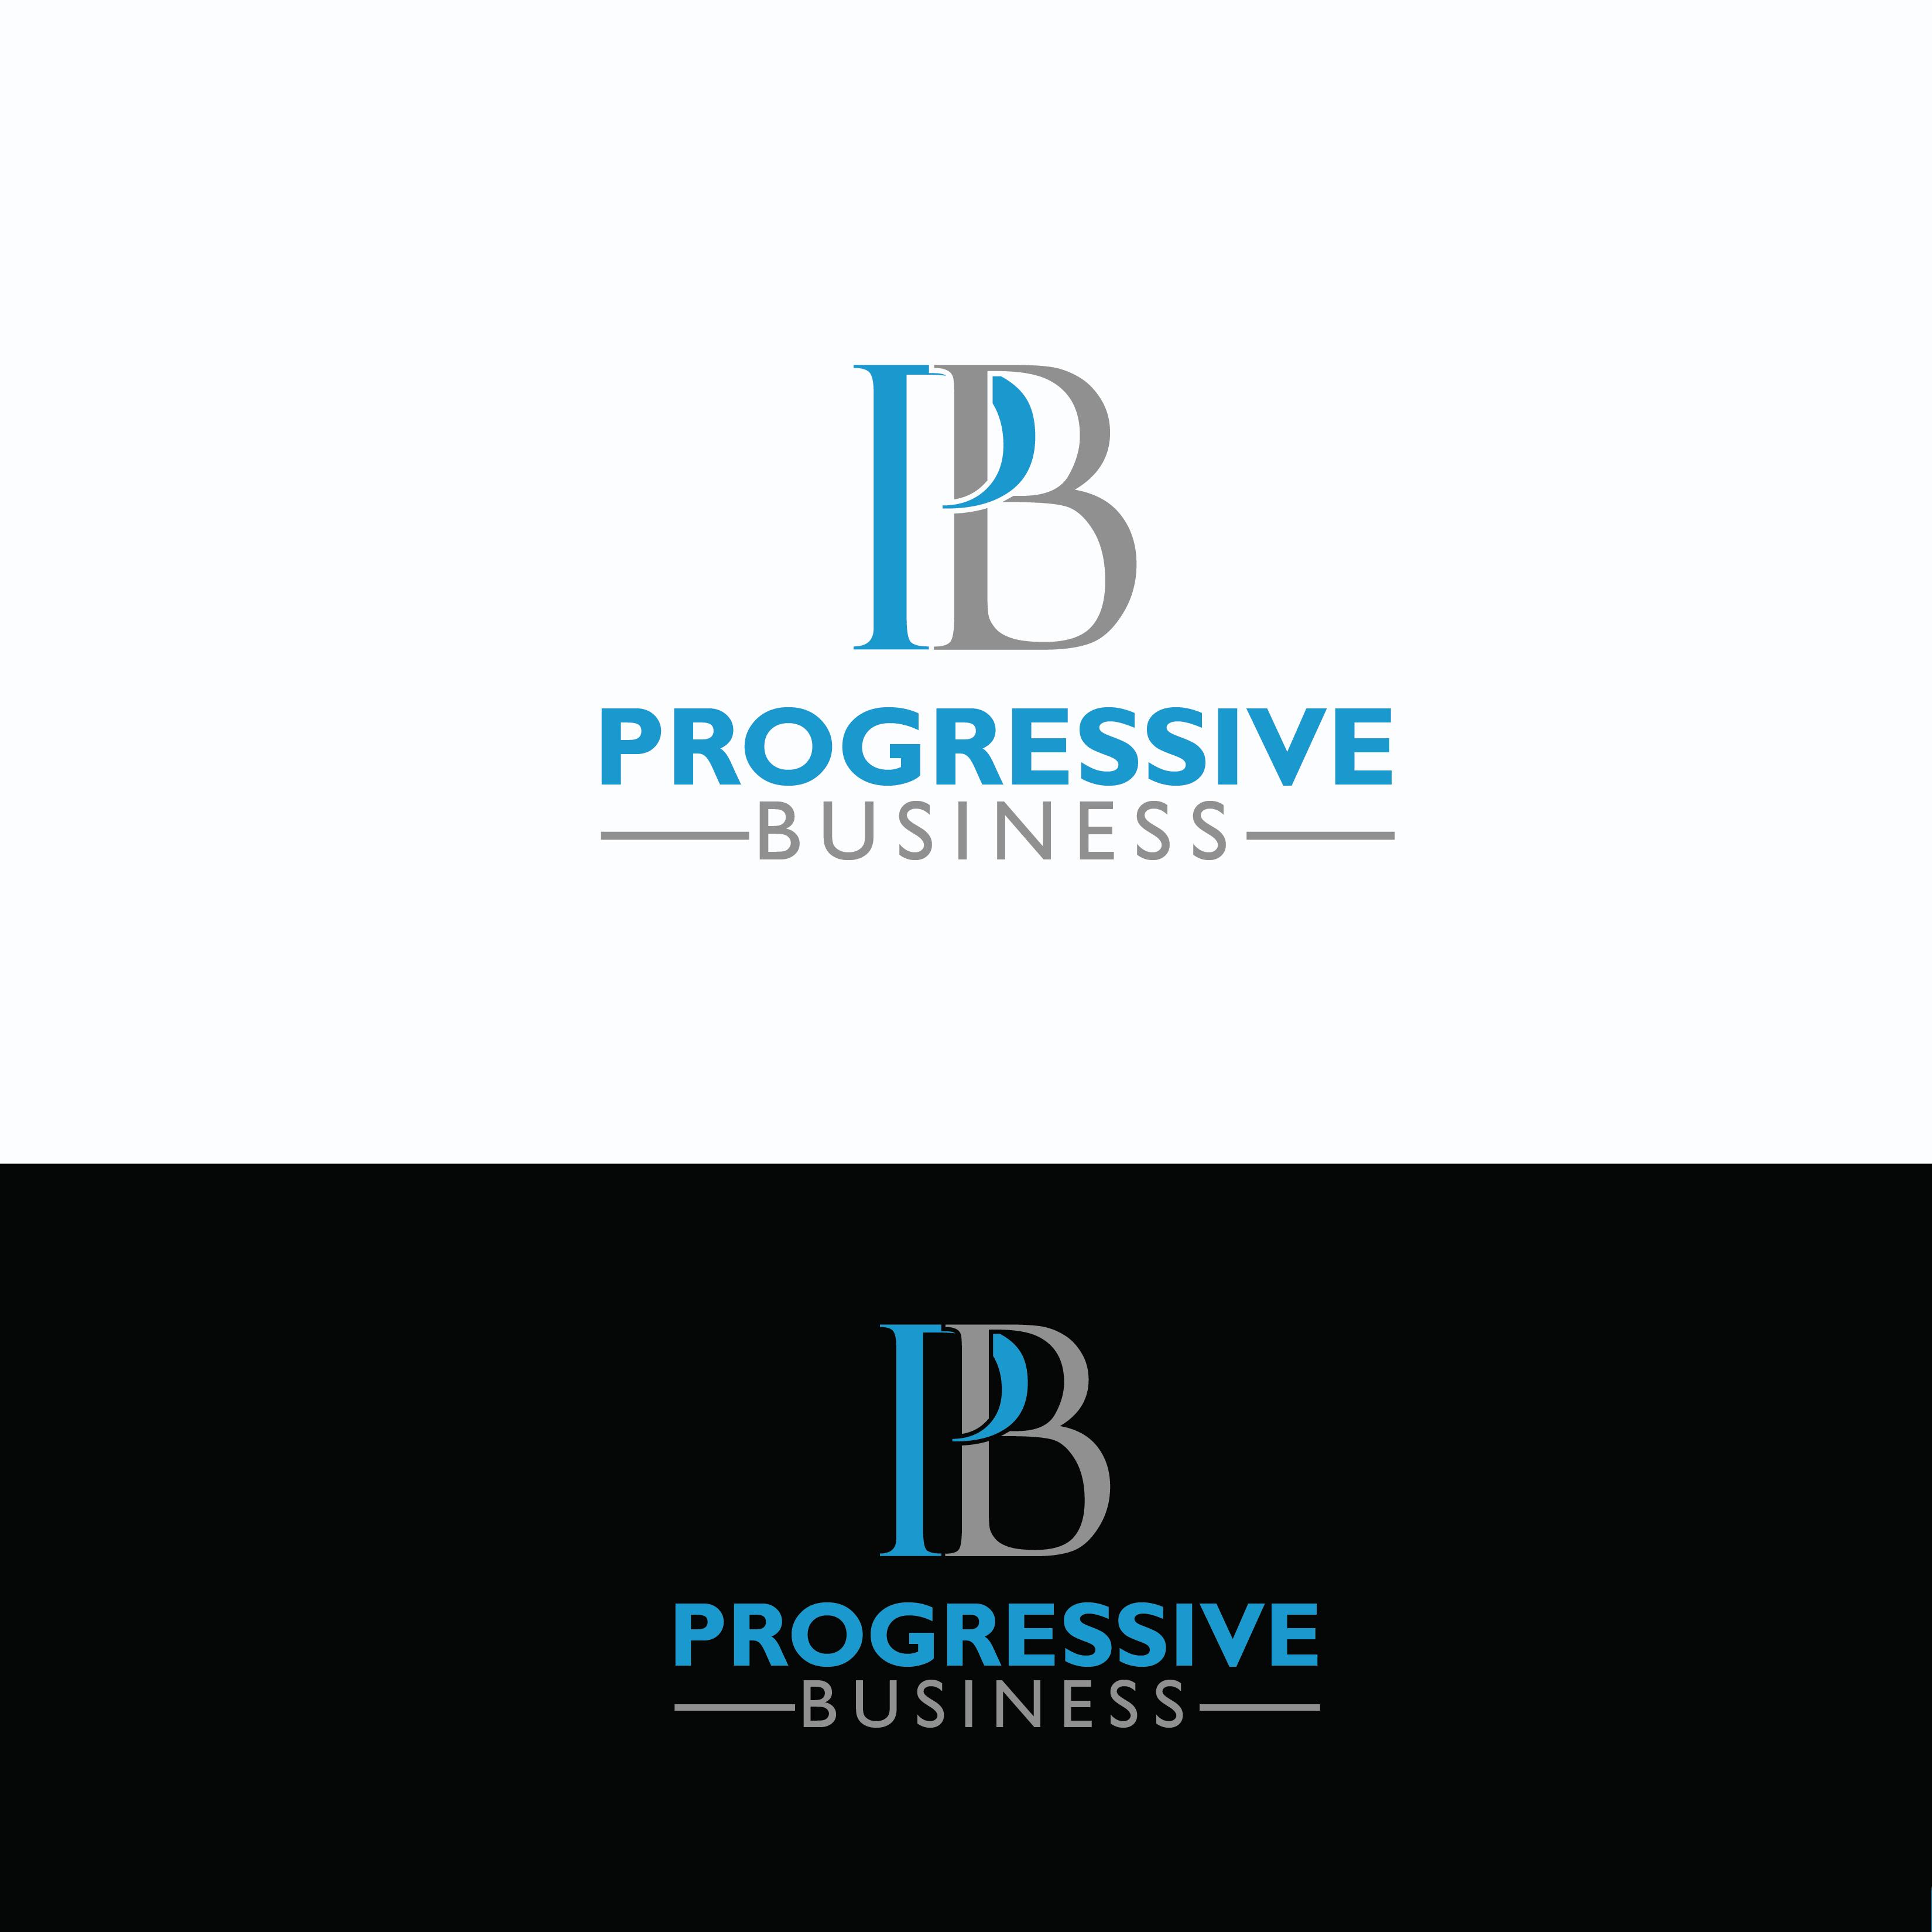 Logo Design by Private User - Entry No. 125 in the Logo Design Contest Captivating Logo Design for Progressive Business.